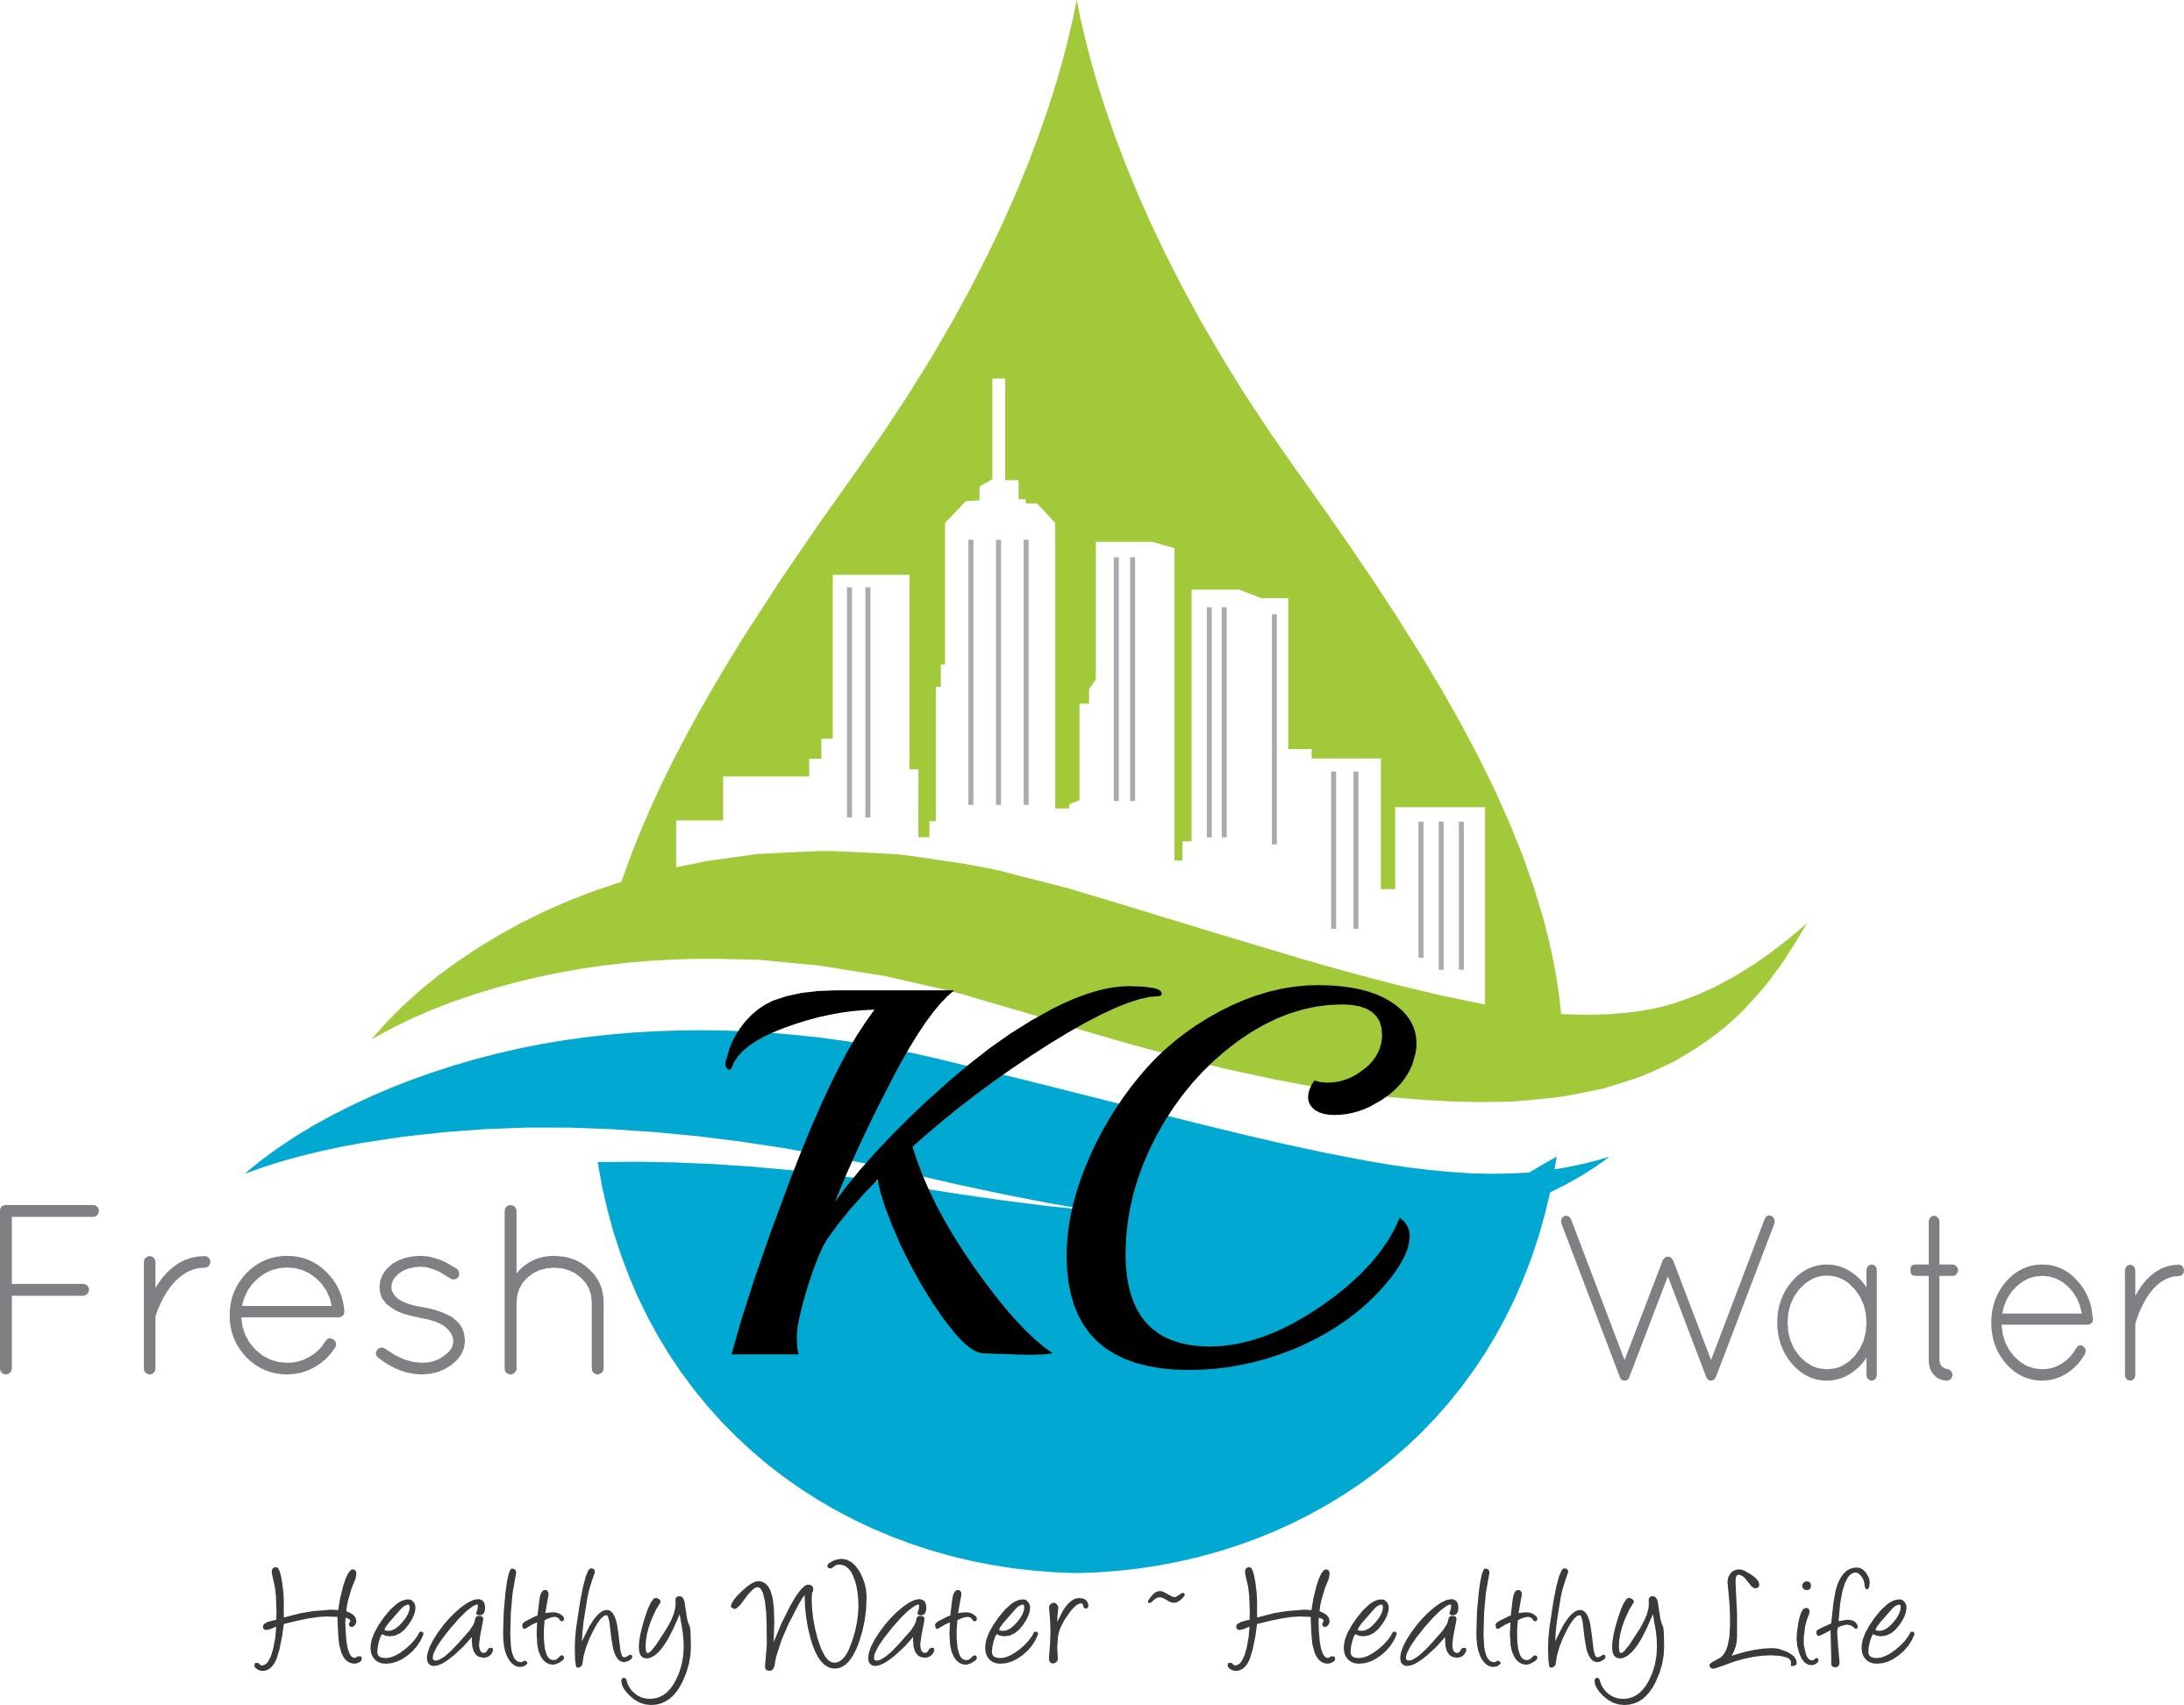 FRESH KC WATER logo